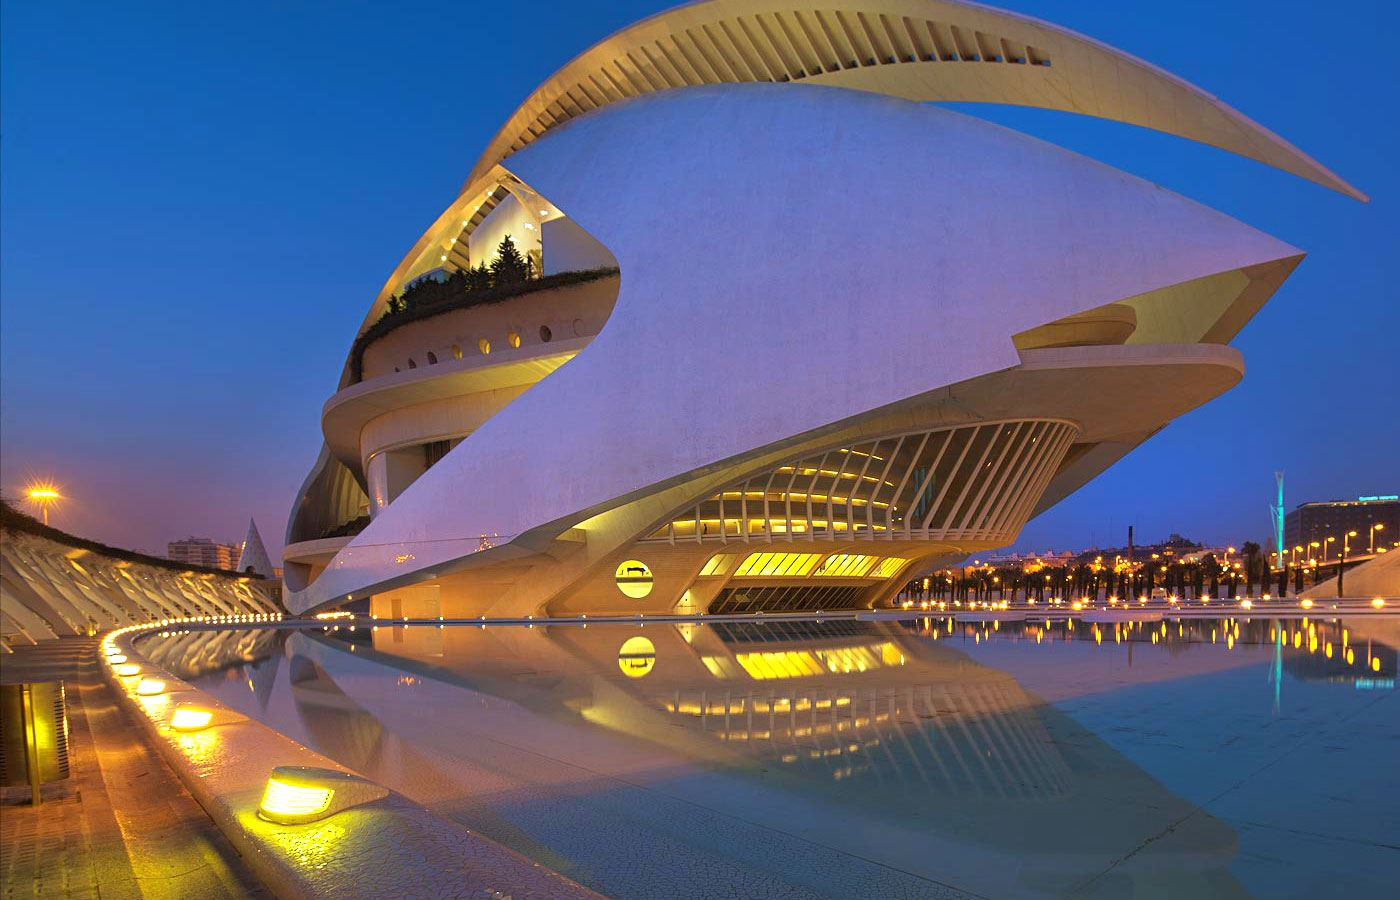 Valencia Spain - Berklee College of Music